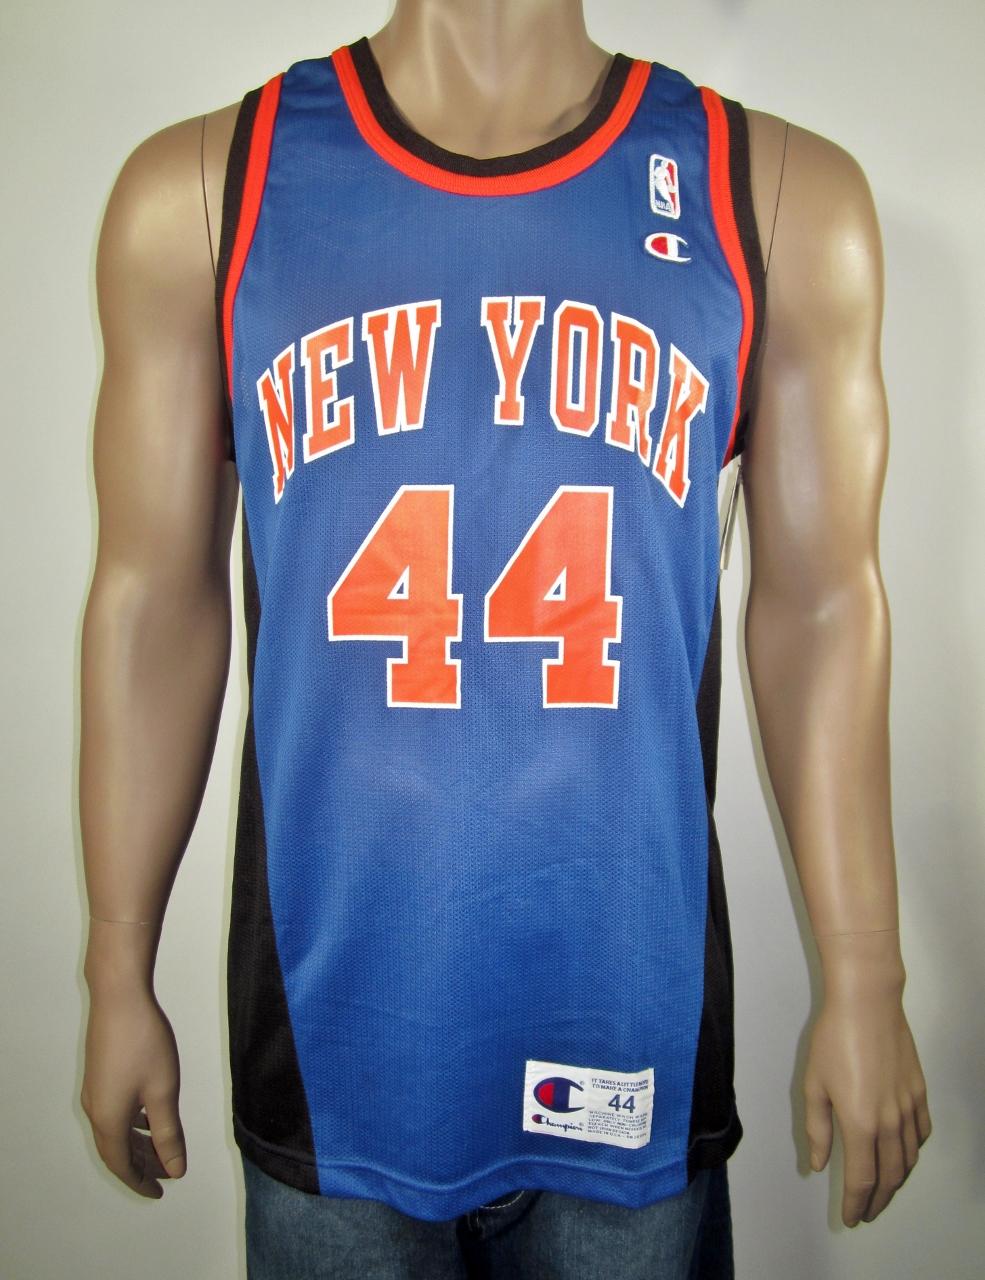 aeb40da8955 Hubert Davis New York Knicks Champion Jersey 44 NWT · DFRNSH8 ...